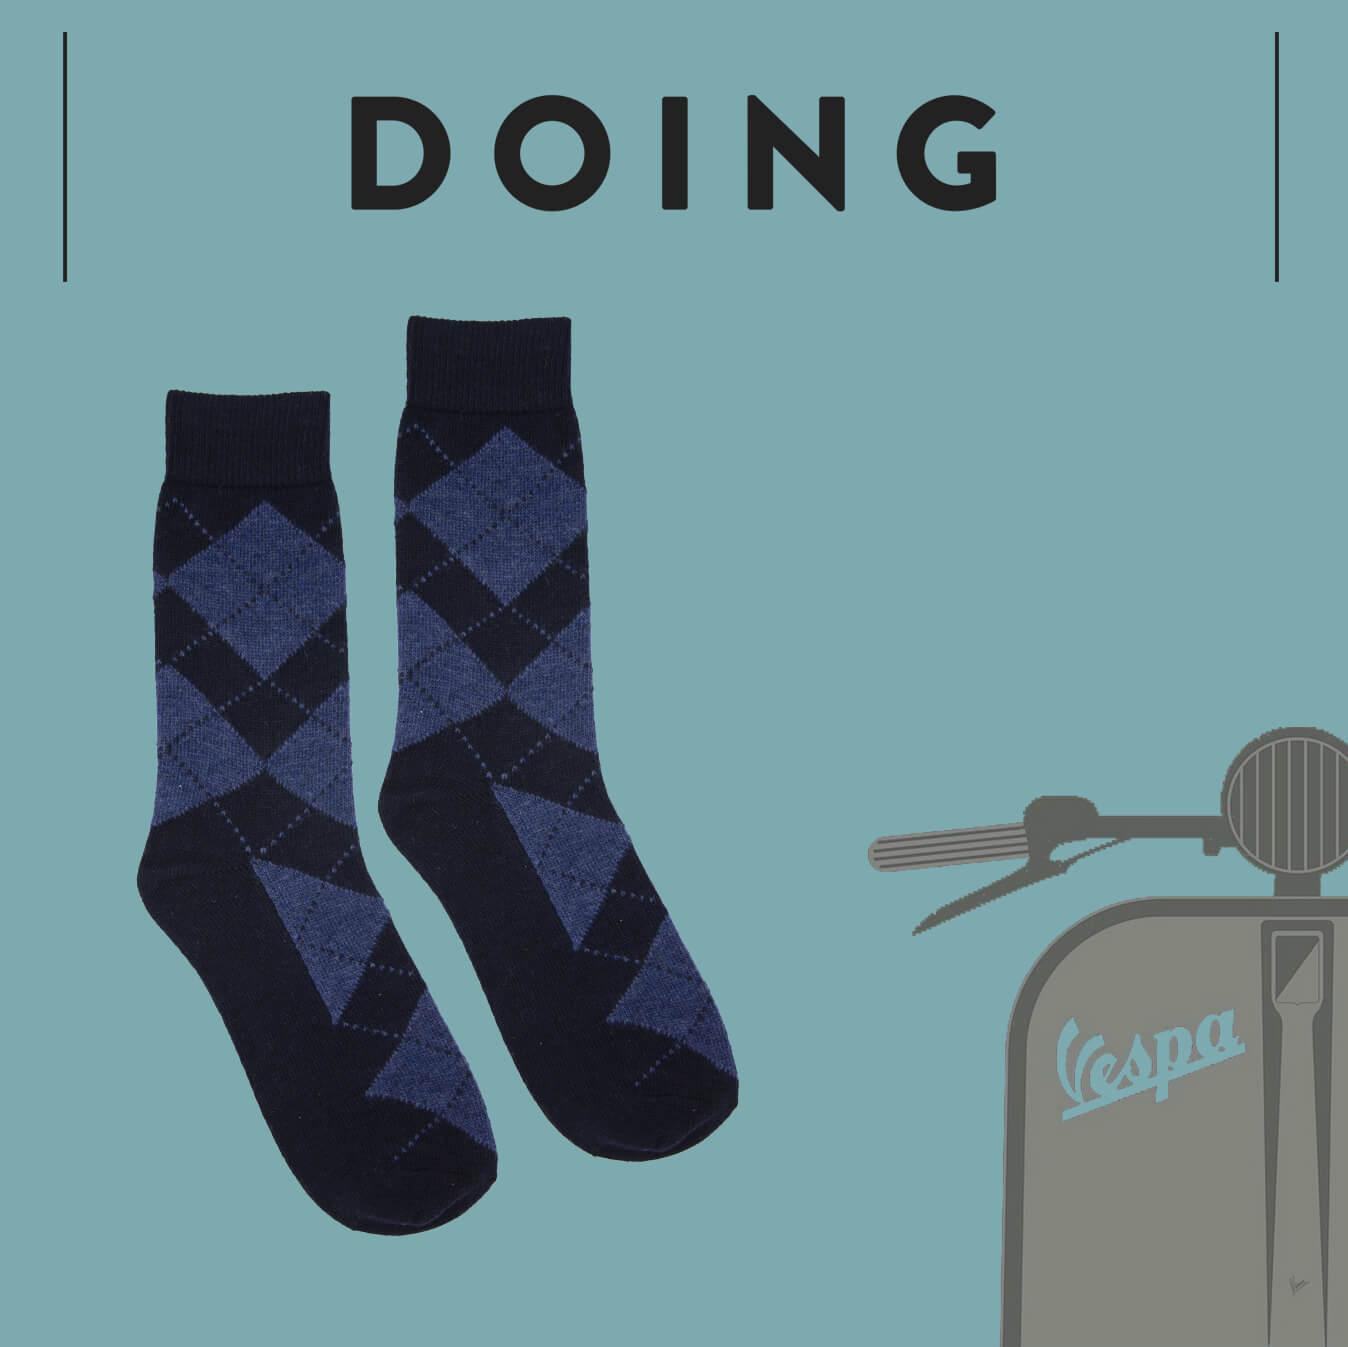 Distributore calze uomo - Doing